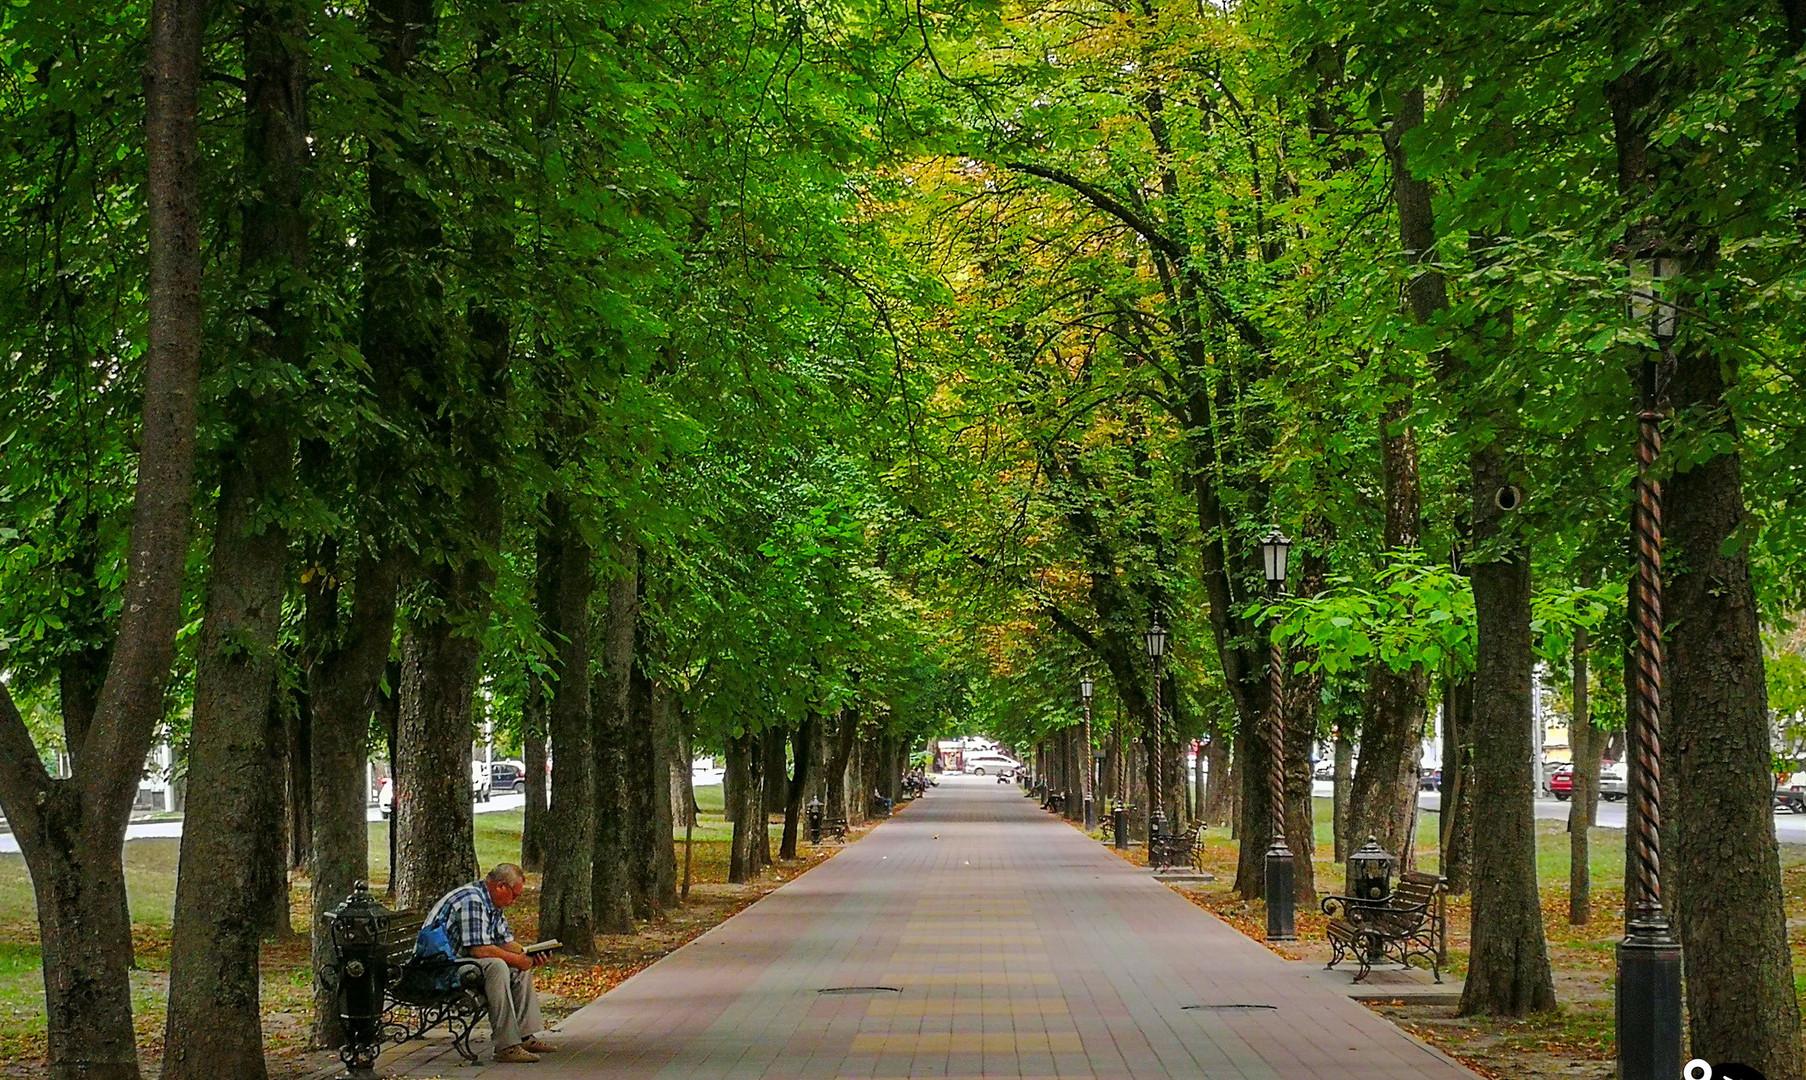 Променад на проспекте Карла Маркса, Ставрополь